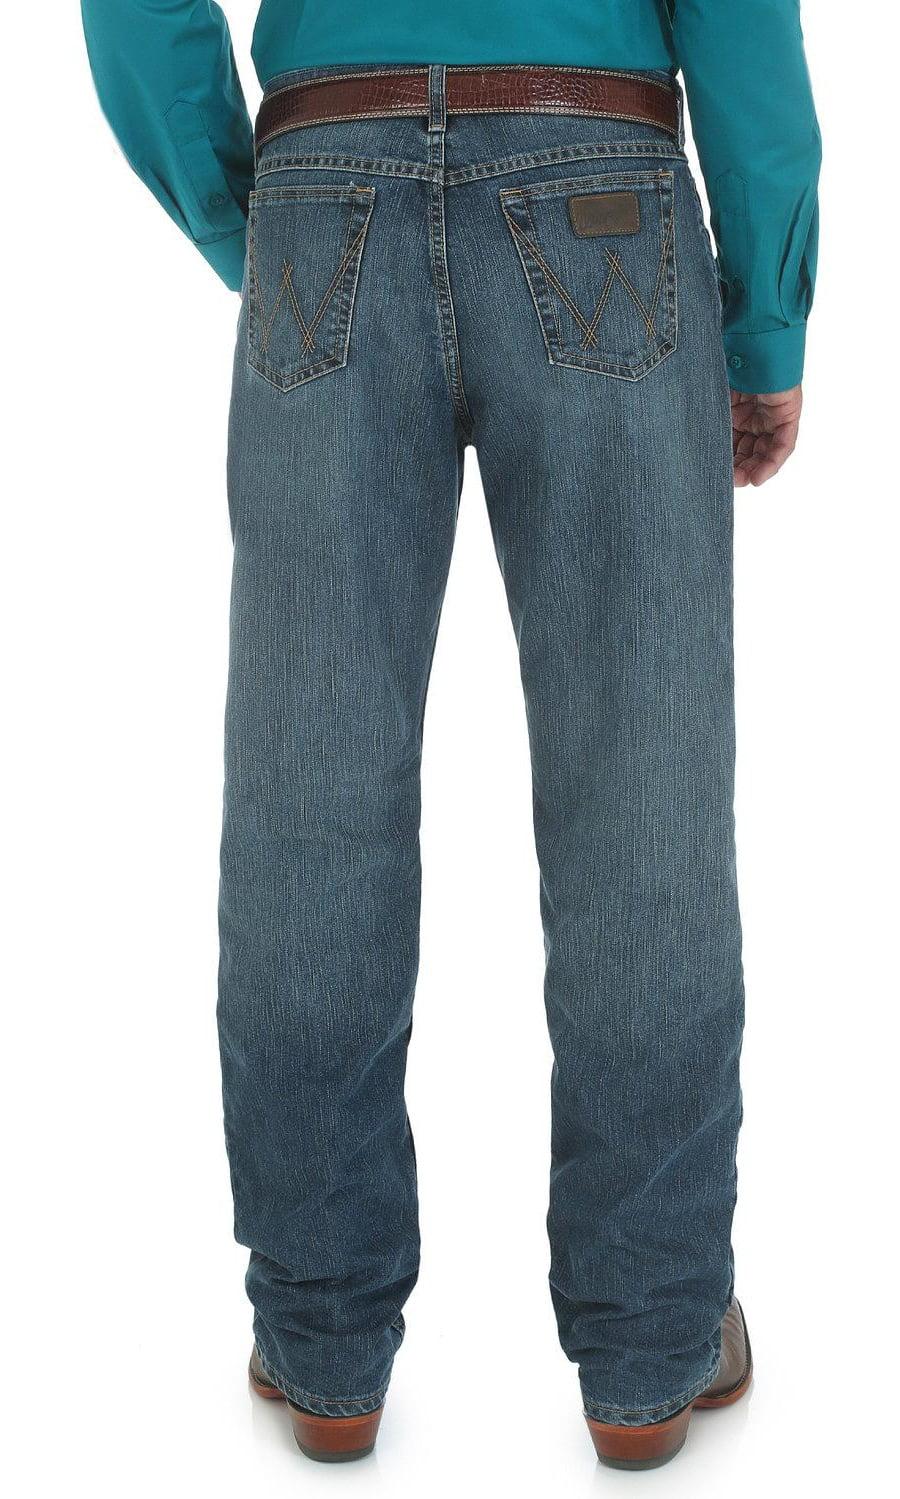 2022c434 Wrangler - Wrangler Men's 20X Cool Vantage Competition Jeans Storm Blue -  01Mcvsb - Walmart.com